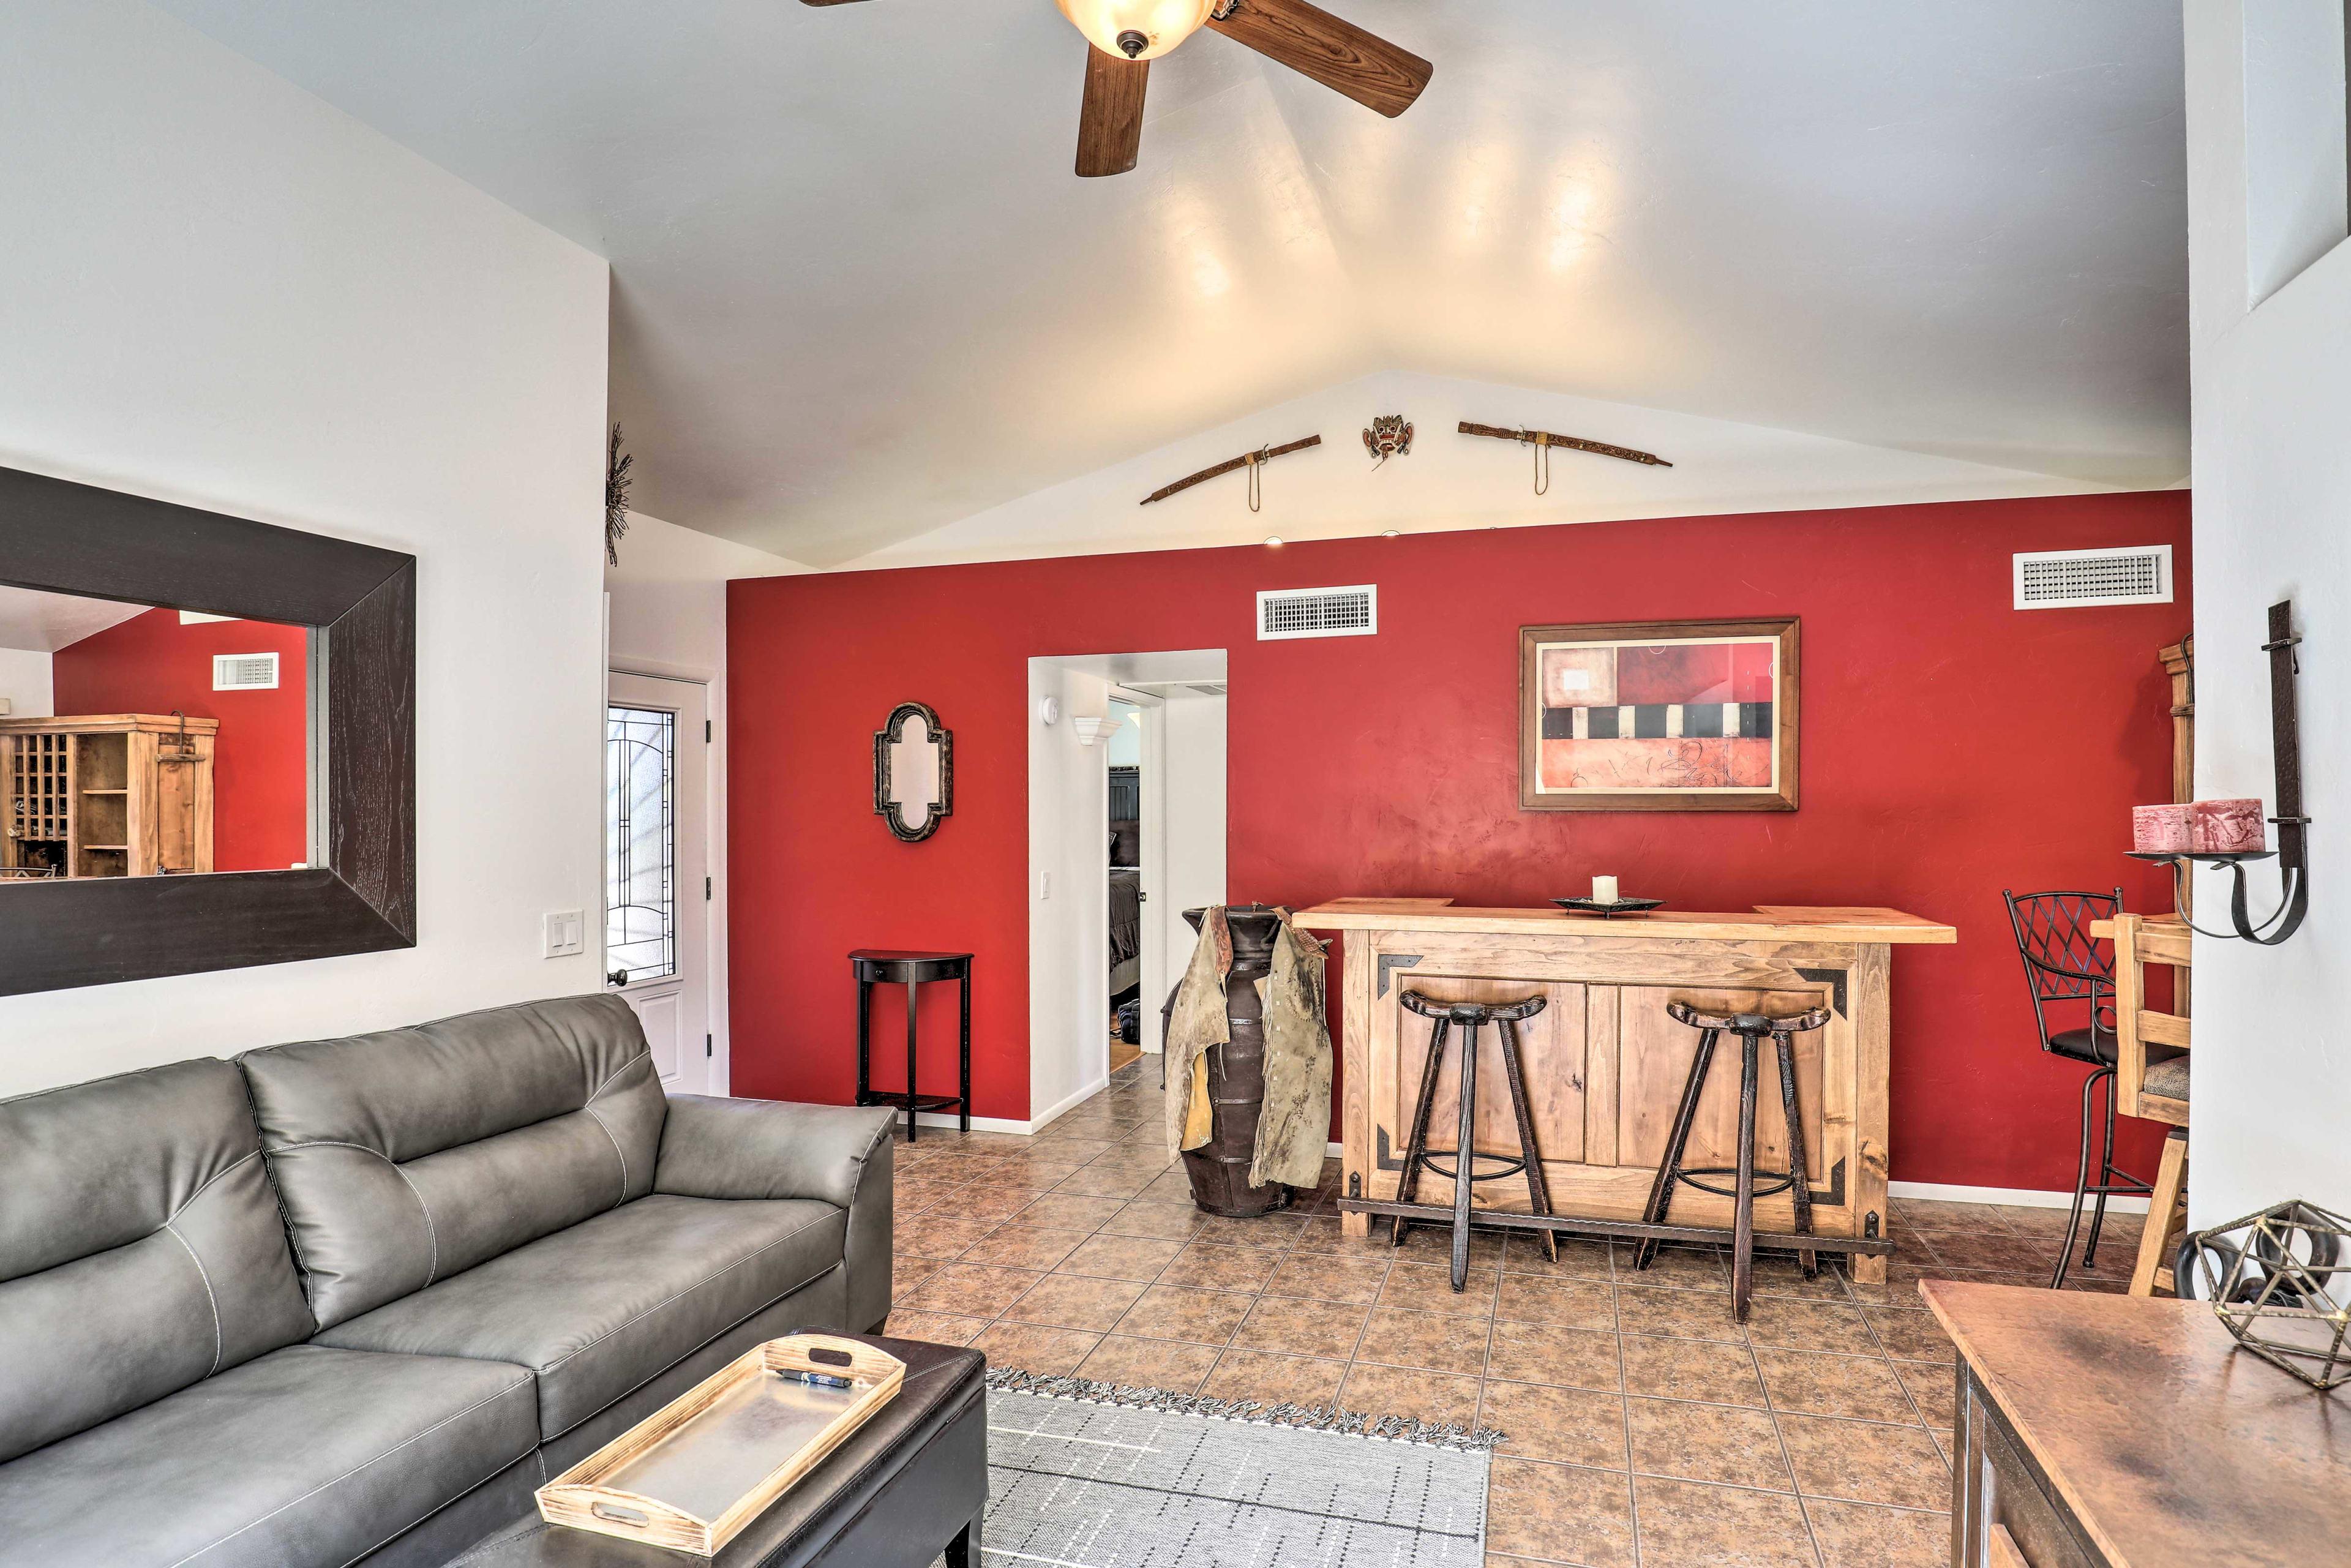 Living Room | Sectional Sofa